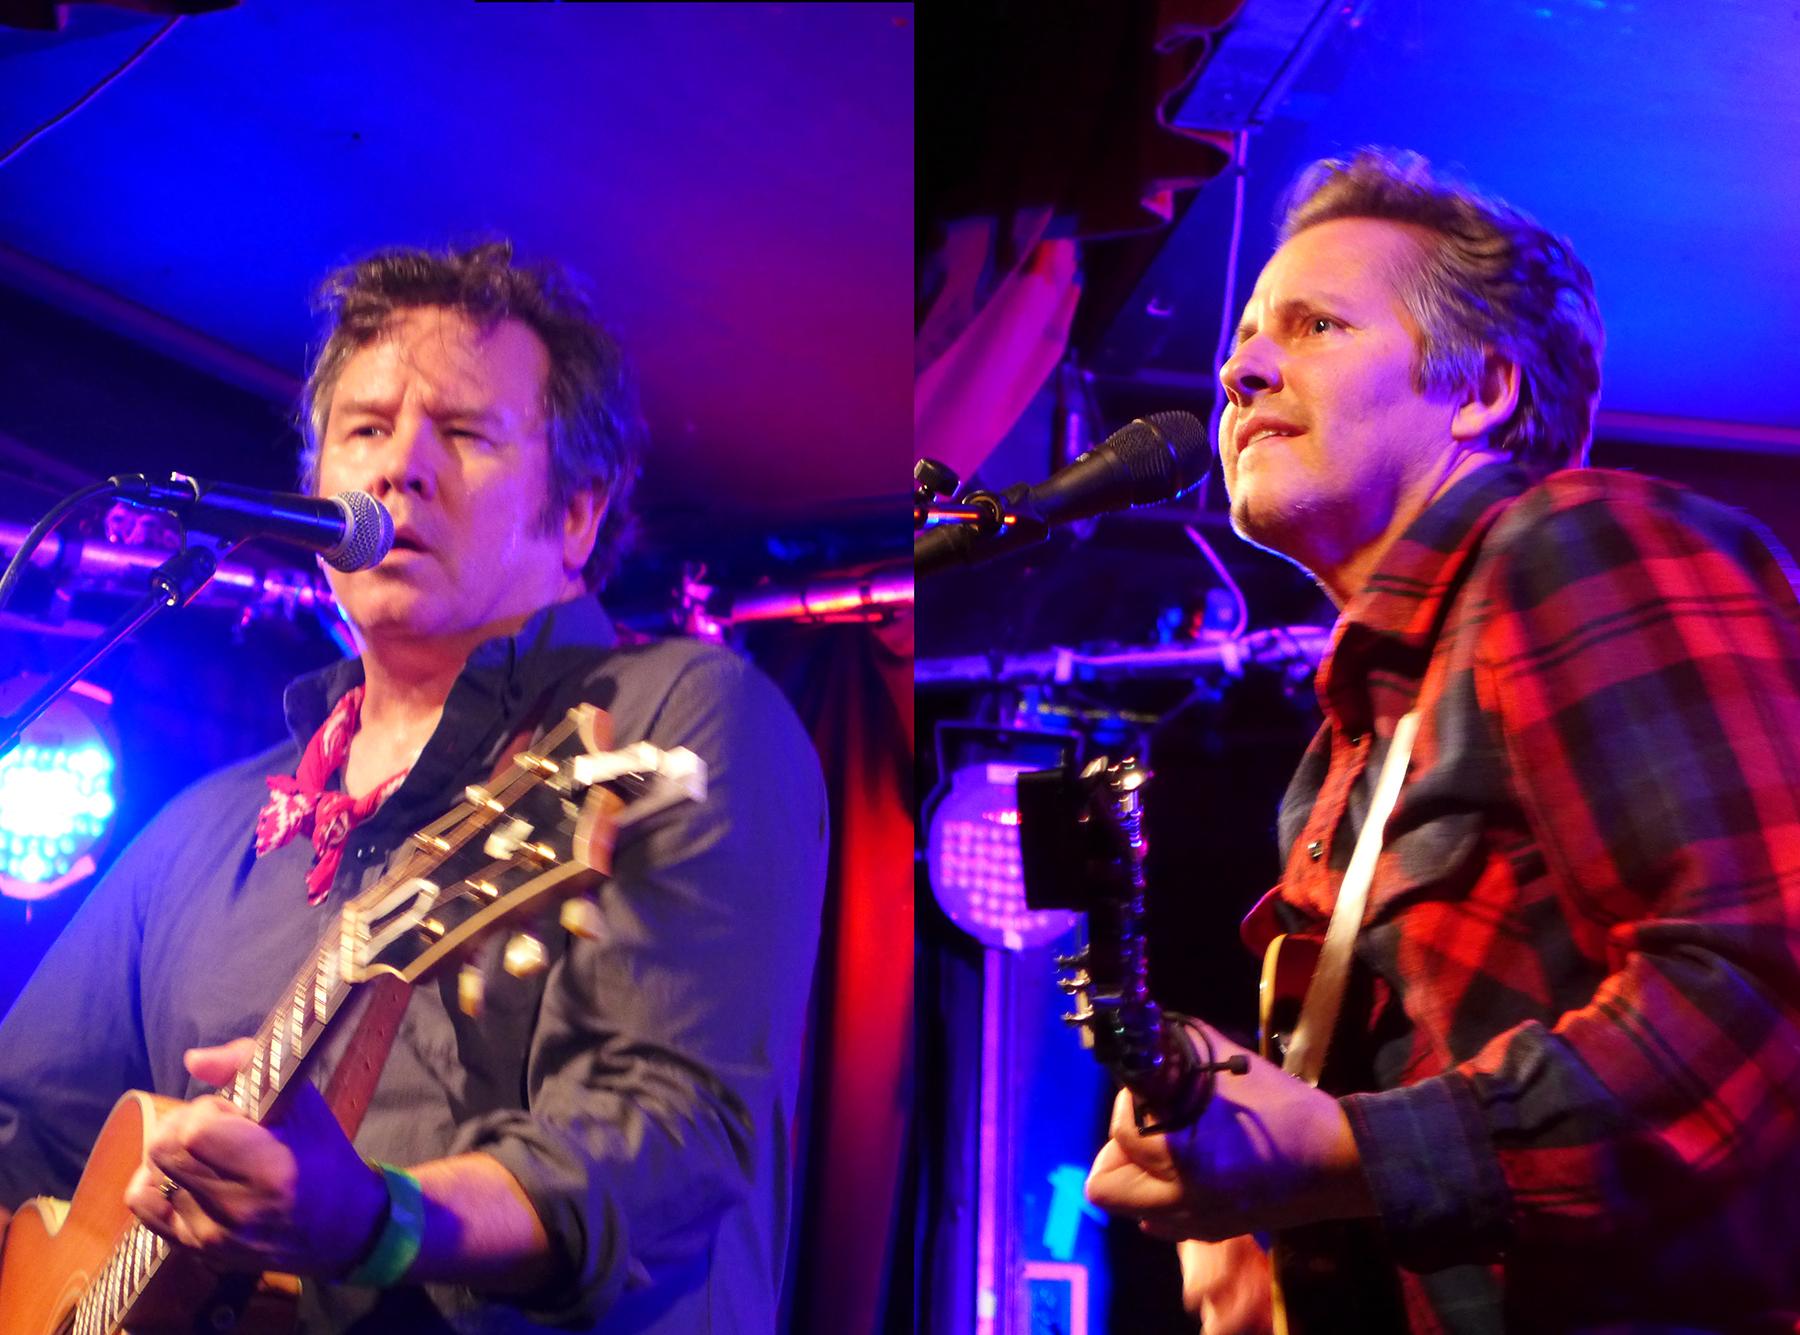 Josh Rouse and Grant Lee Phillips @ Whelan's, Dublin - 30th April